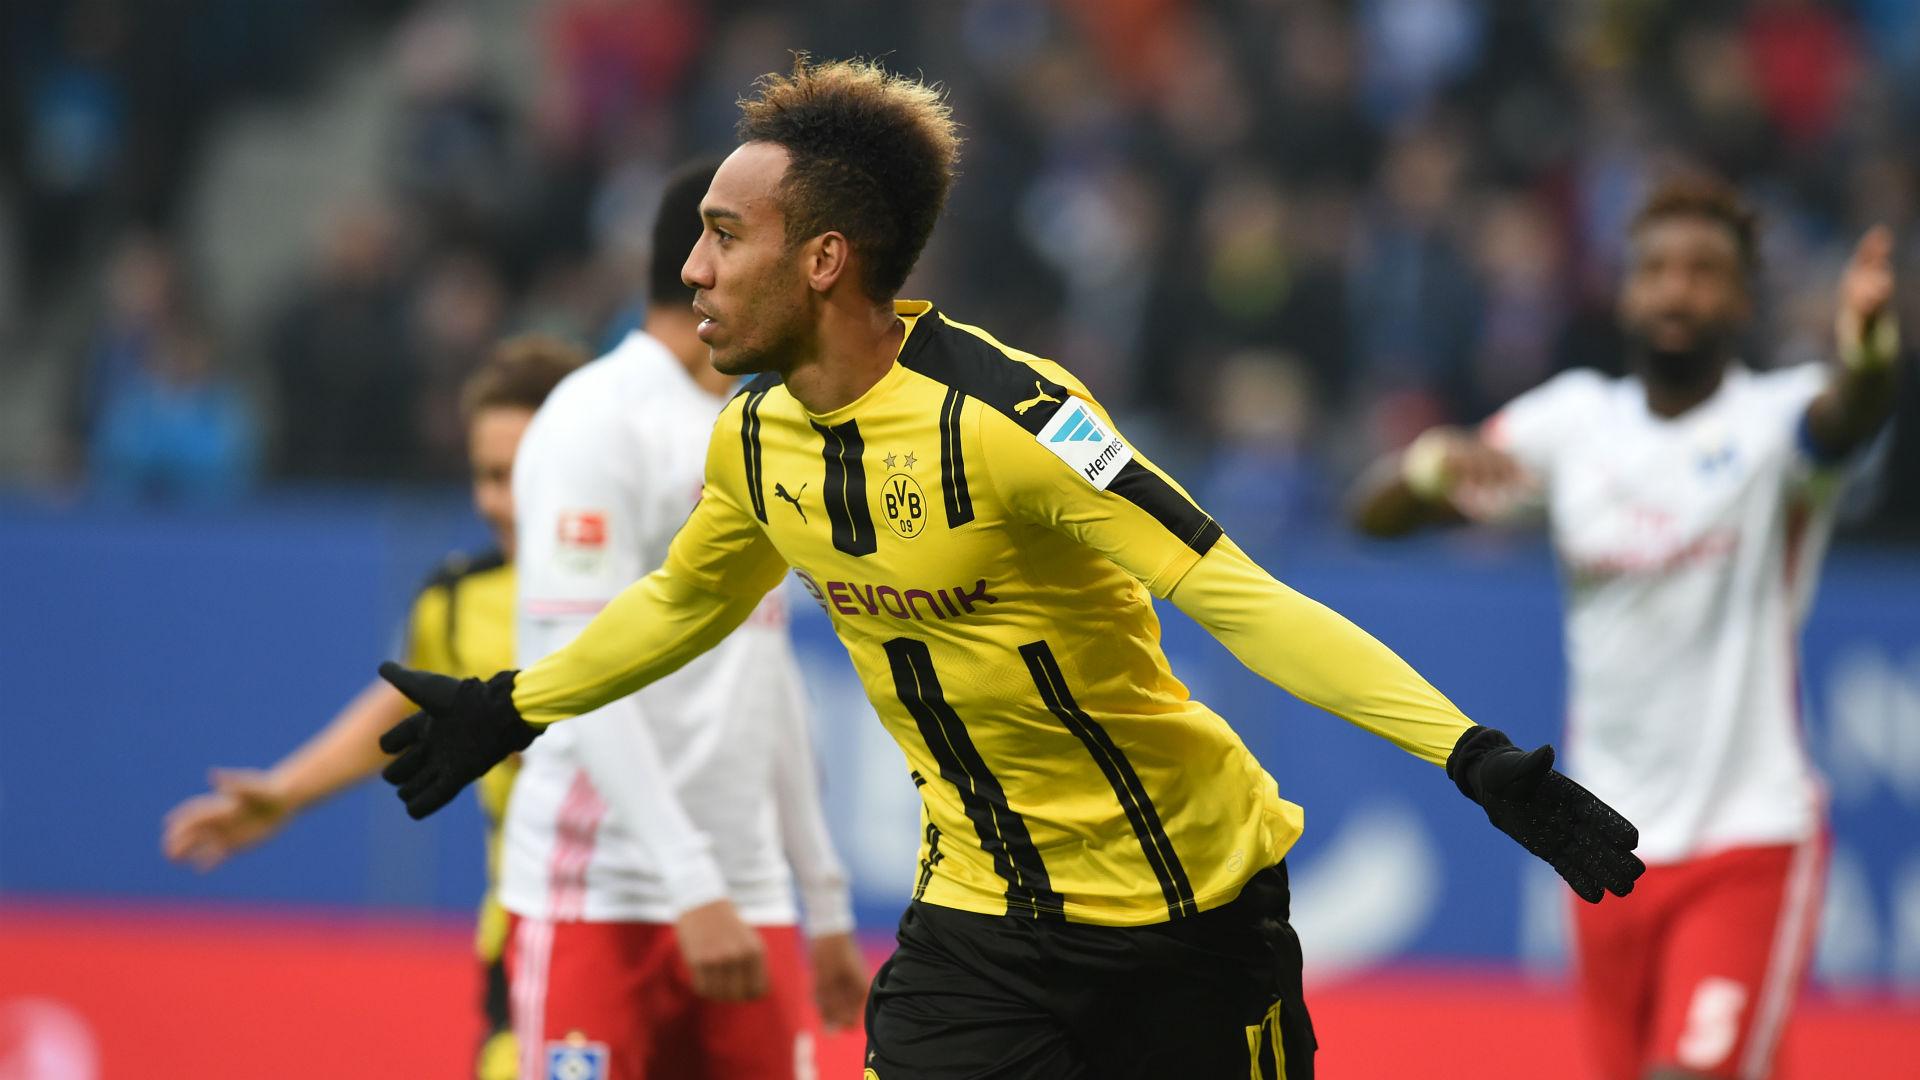 Pierre Emerick Aubameyang Borussia Dortmund v Hamburg Goal